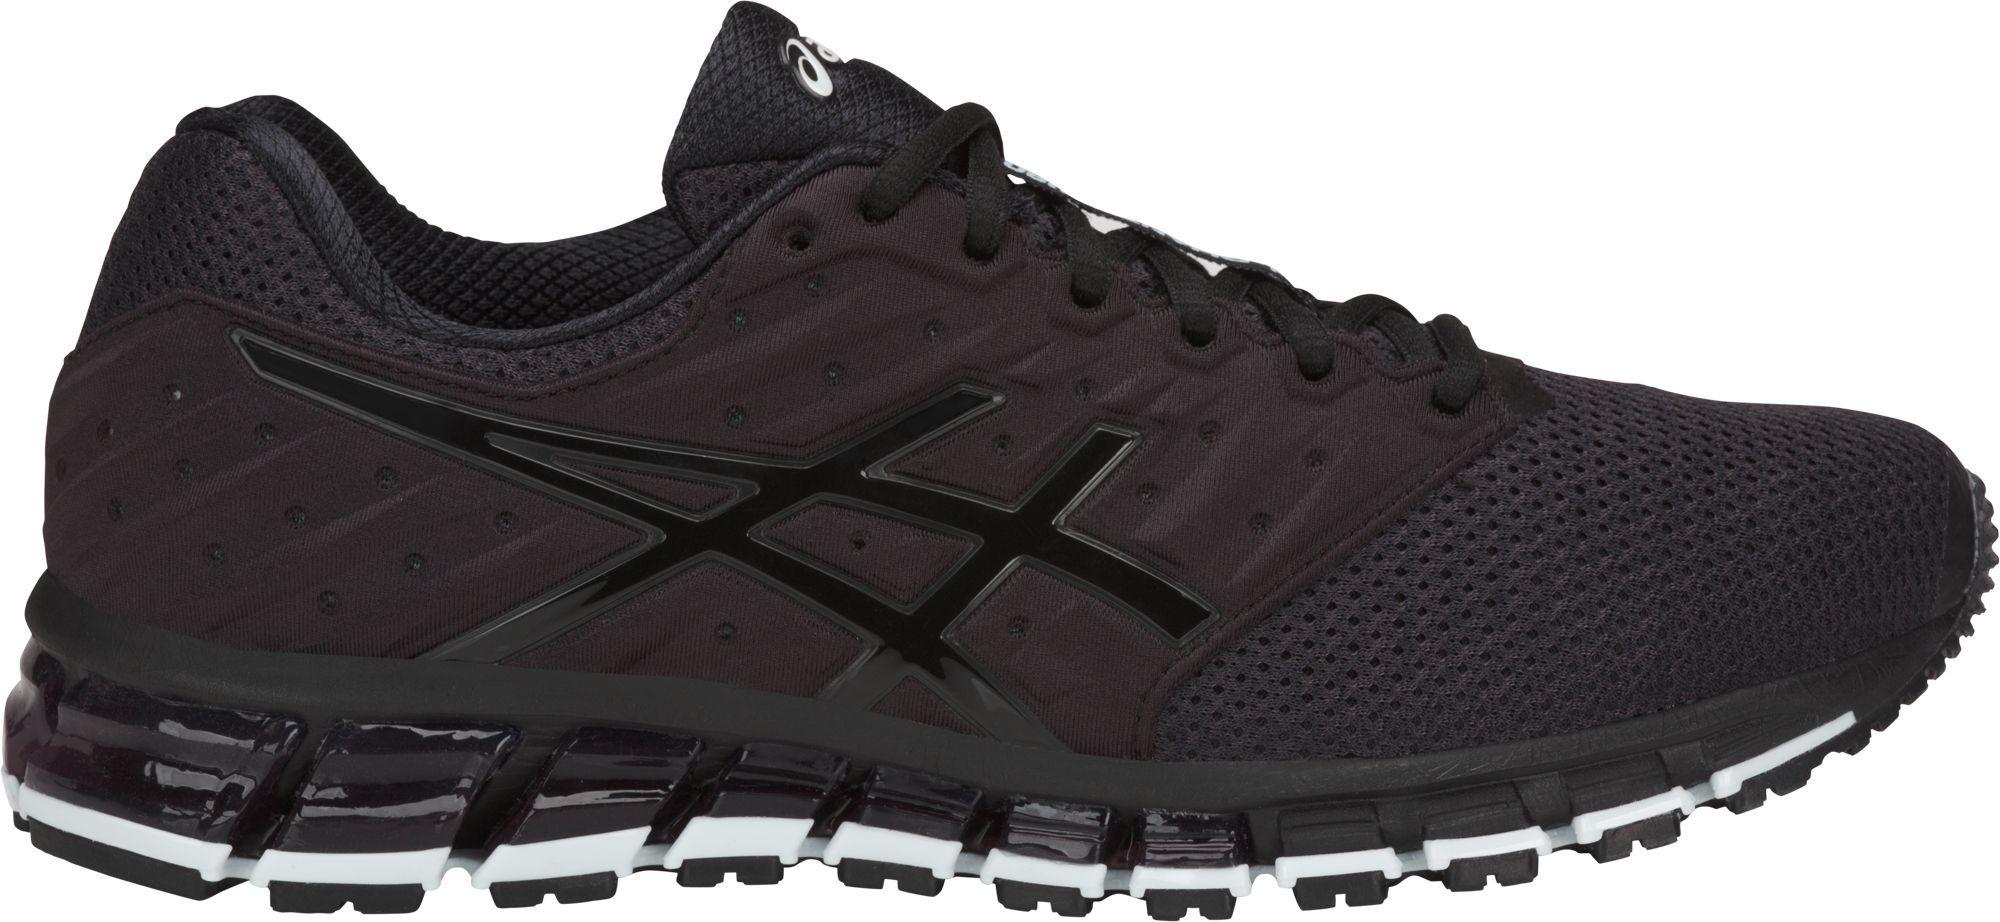 Asics Men S Gel Quantum 180 2 Mx Running Shoes Running Shoes For